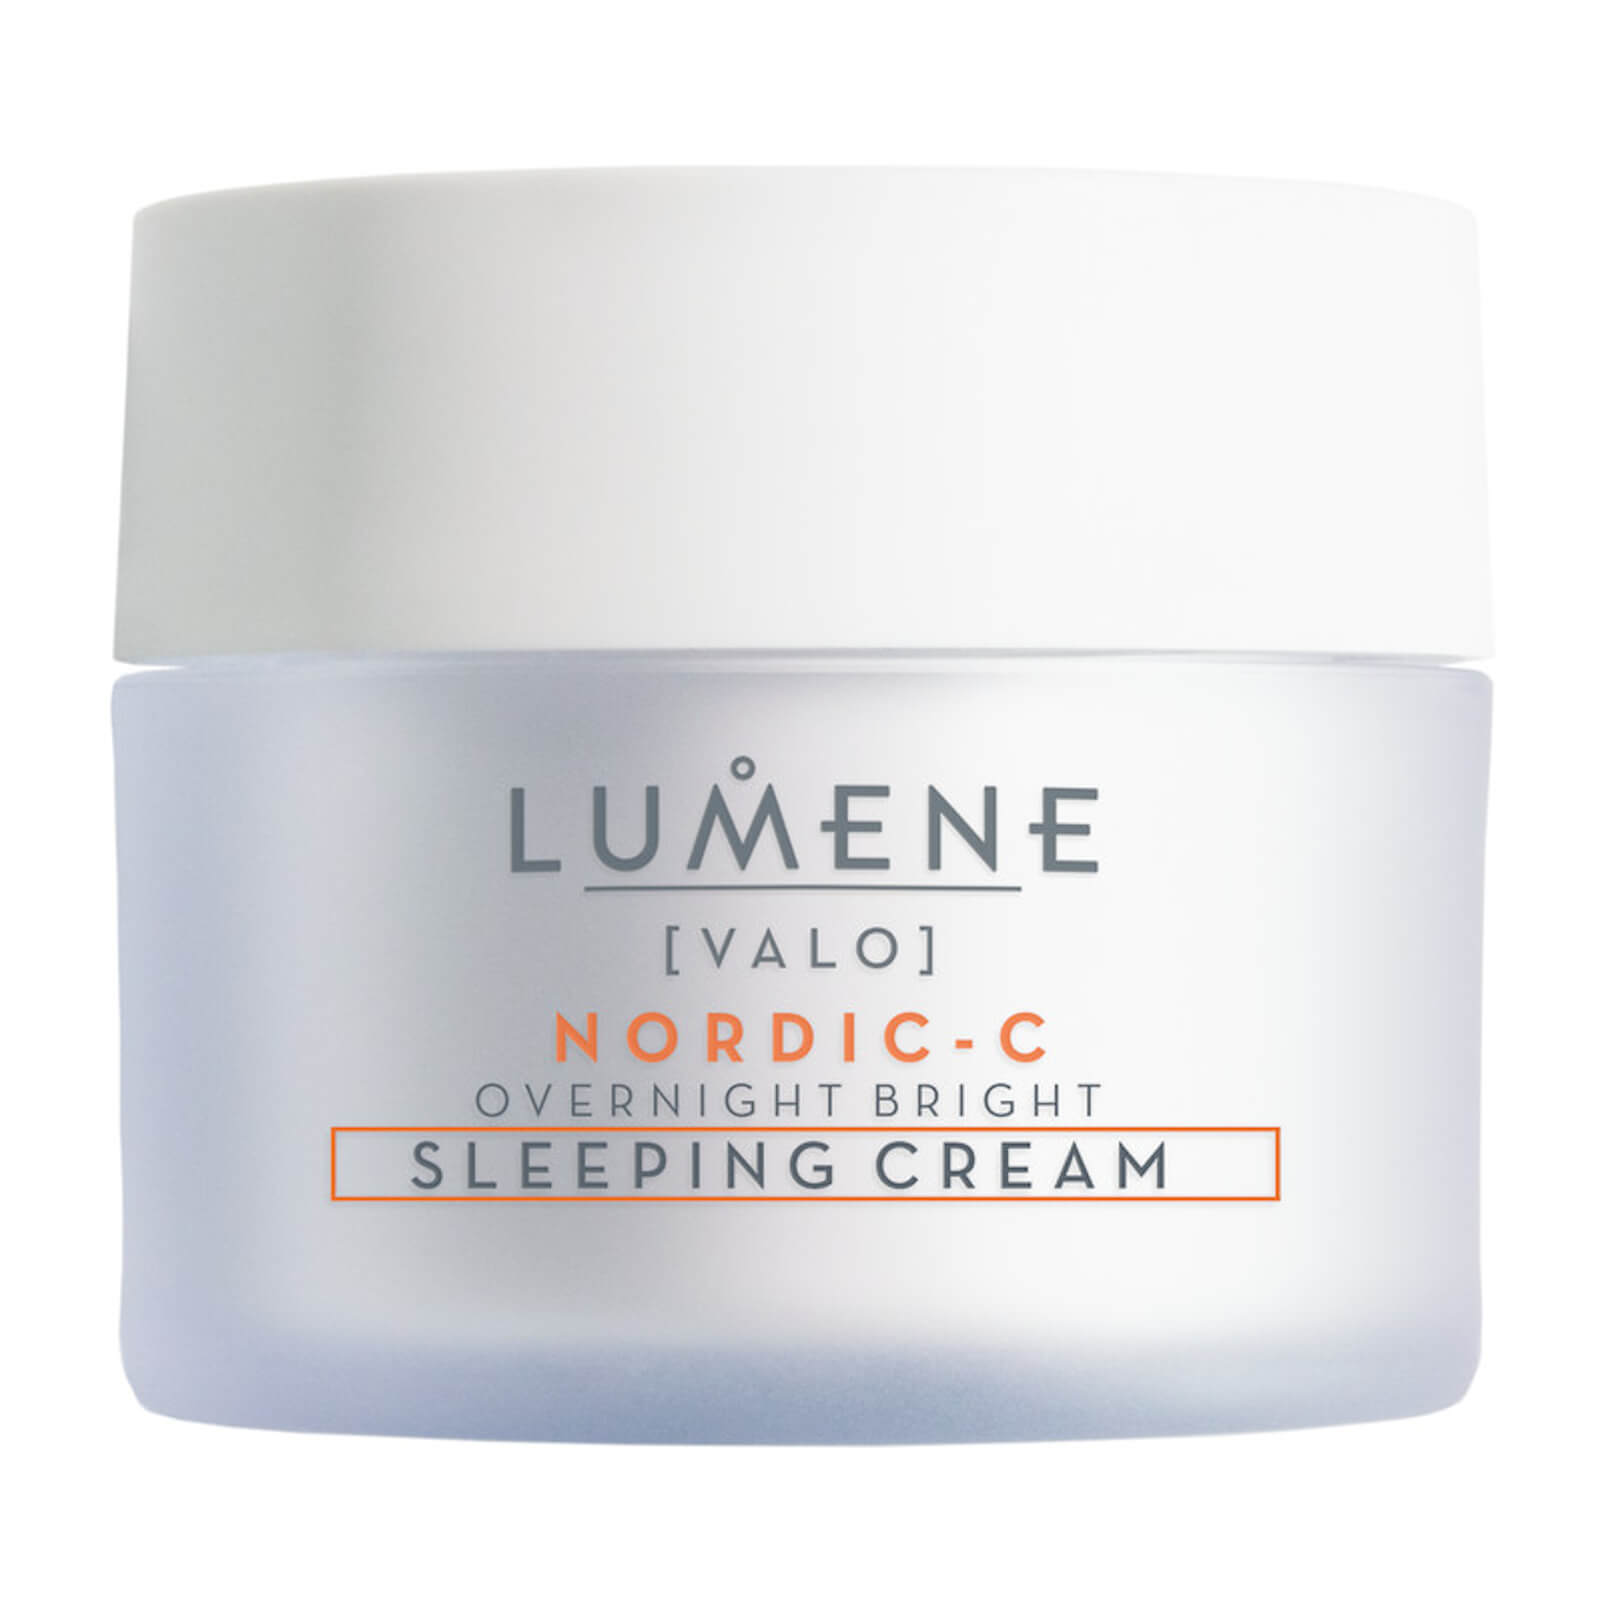 Lumene Nordic C [Valo] Overnight Bright Sleeping Cream 50ml